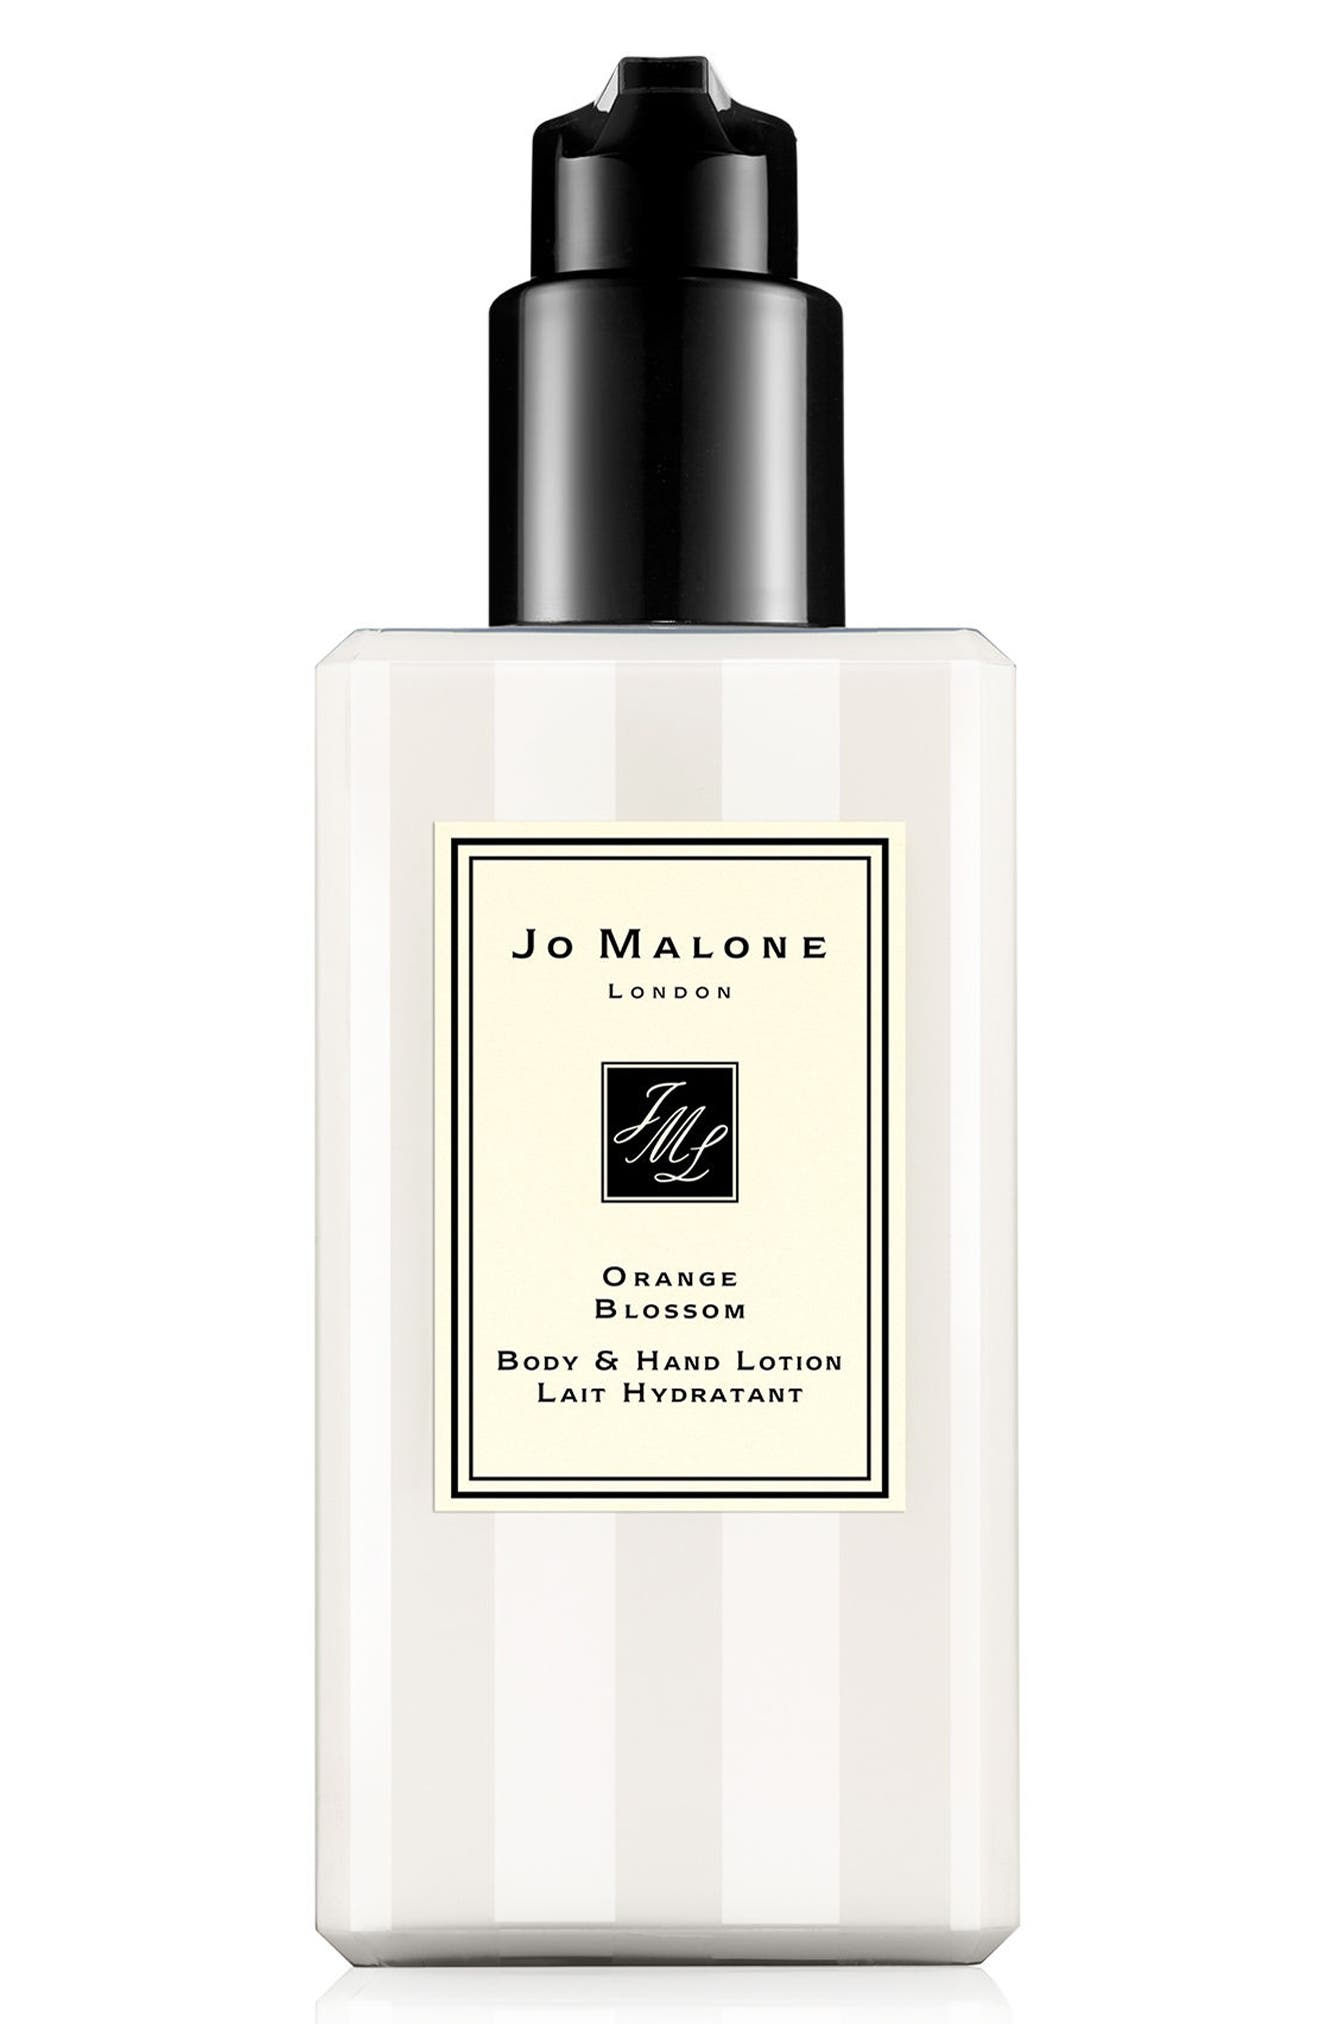 Jo Malone London™ 'Orange Blossom' Body Lotion